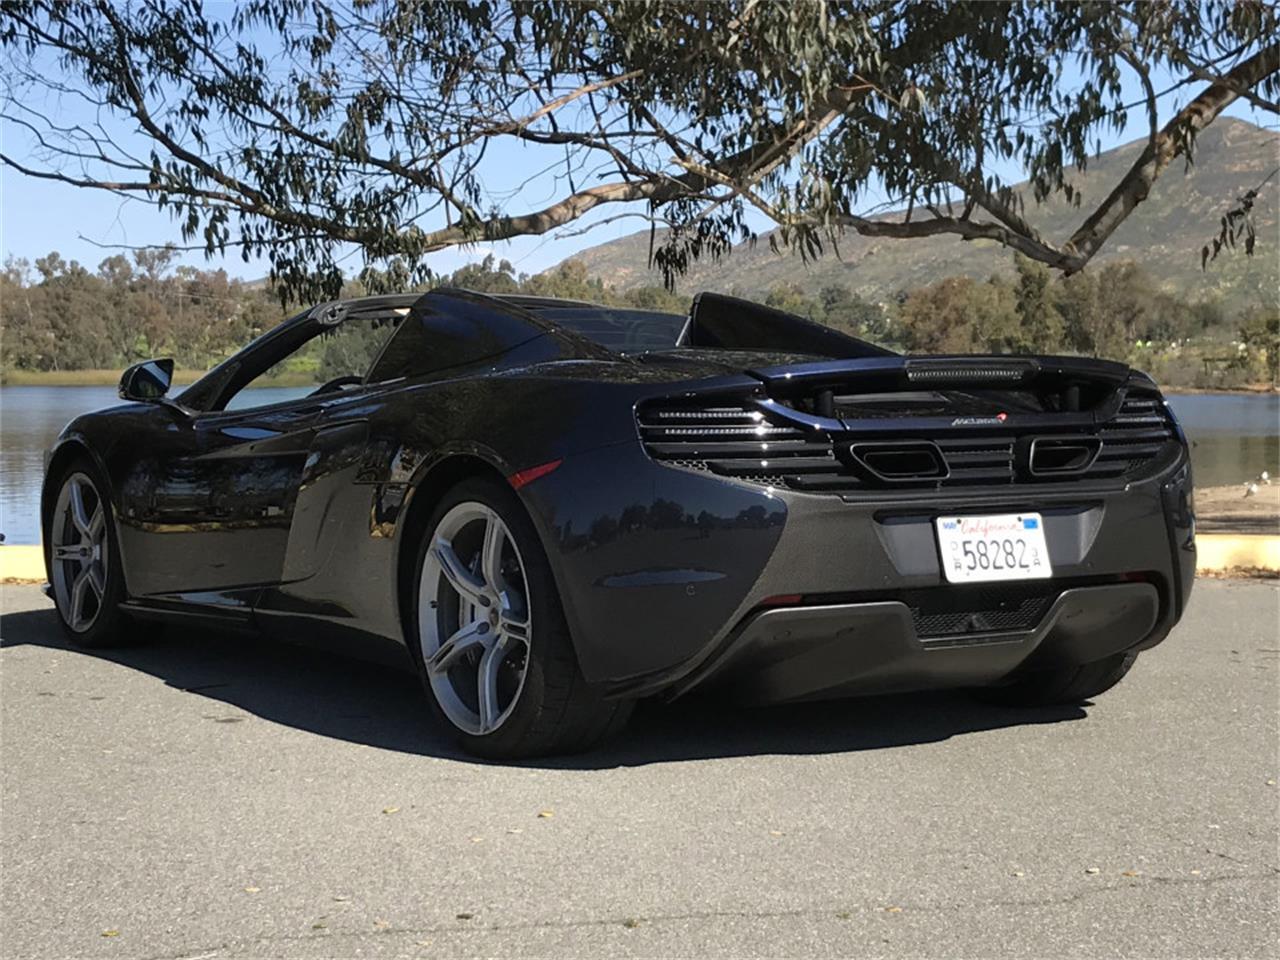 2017 McLaren 650S Spider (CC-1195963) for sale in san diego, California